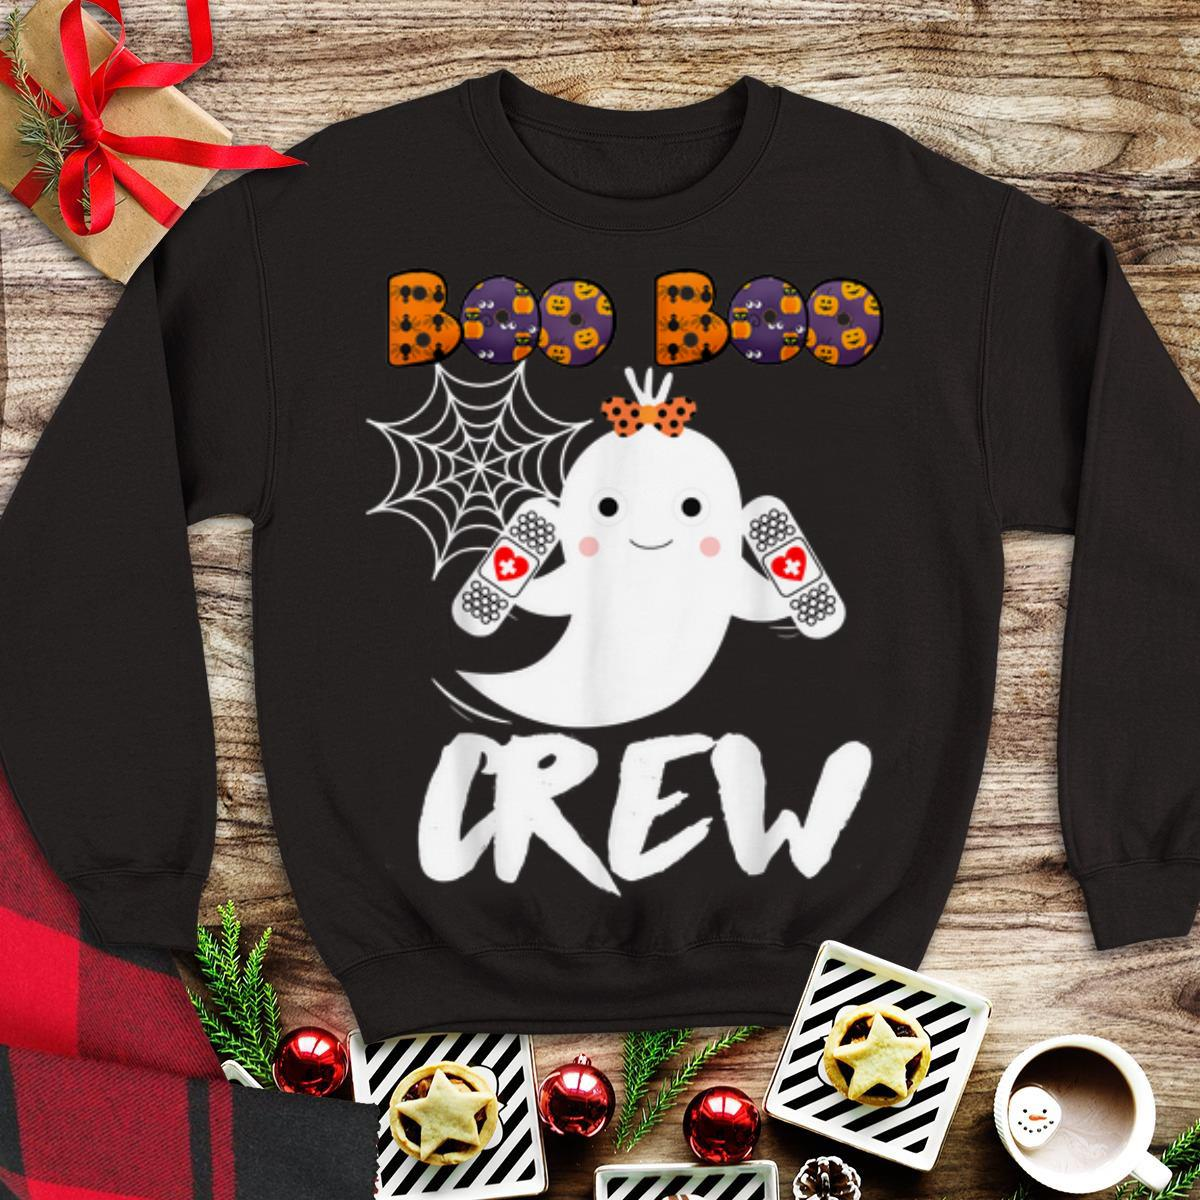 Hot Boo Boo Crew Nurse Cute Halloween Costume shirt